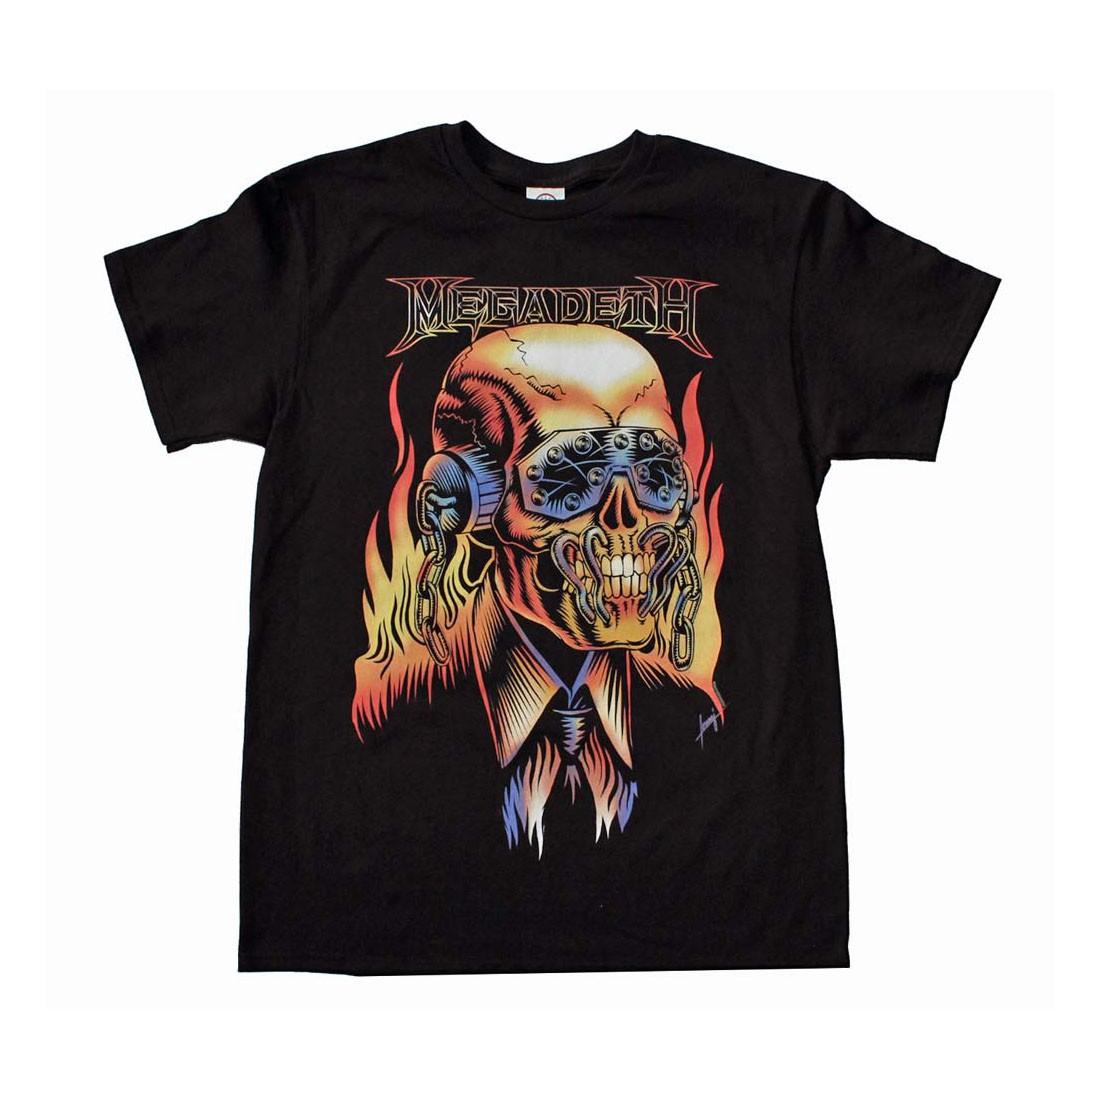 Megadeth Vic Rattlehead T-Shirt